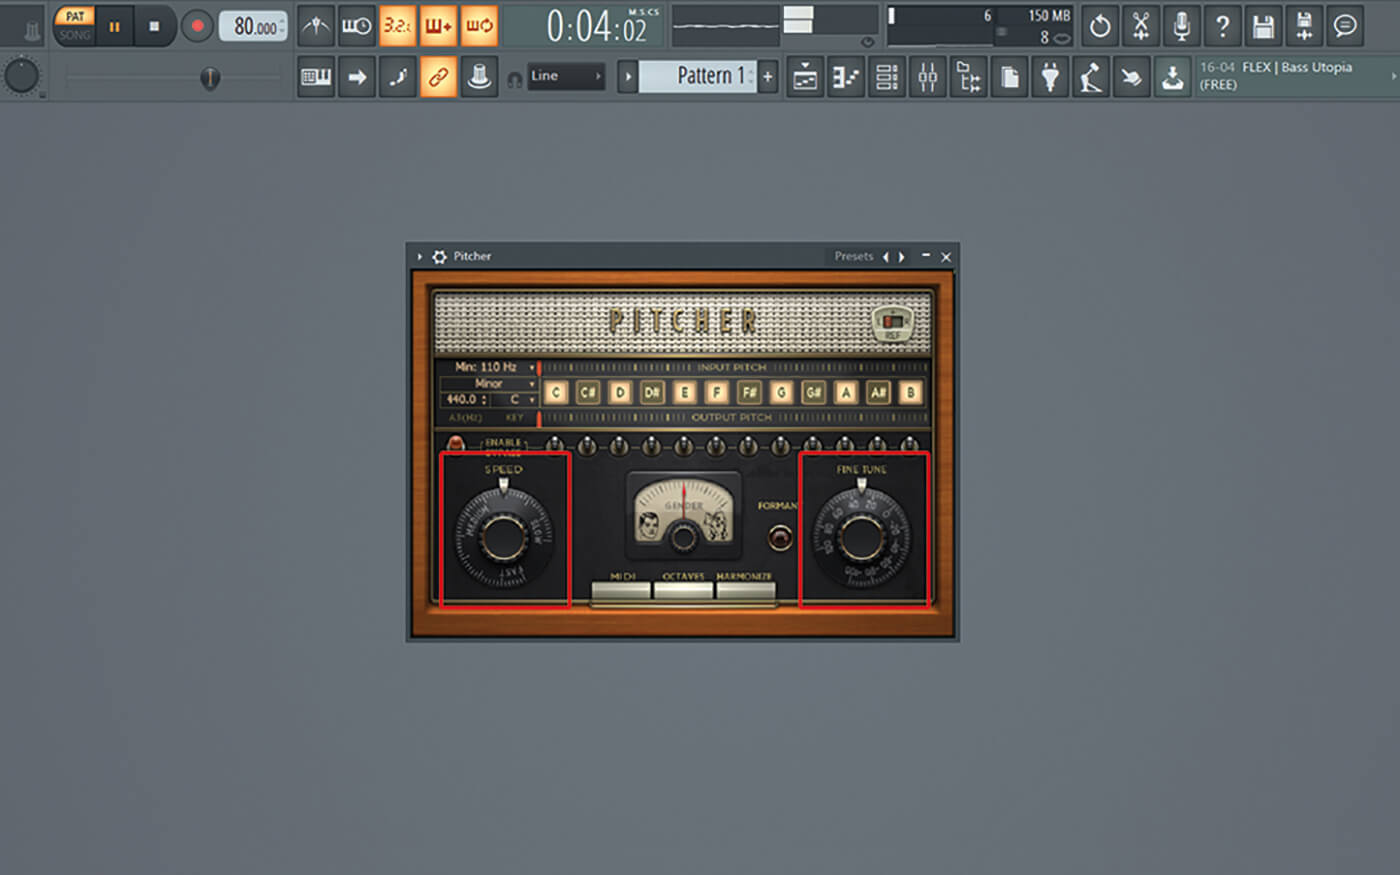 MT208 FLT Studio Lo-Fi Beats TUT 15